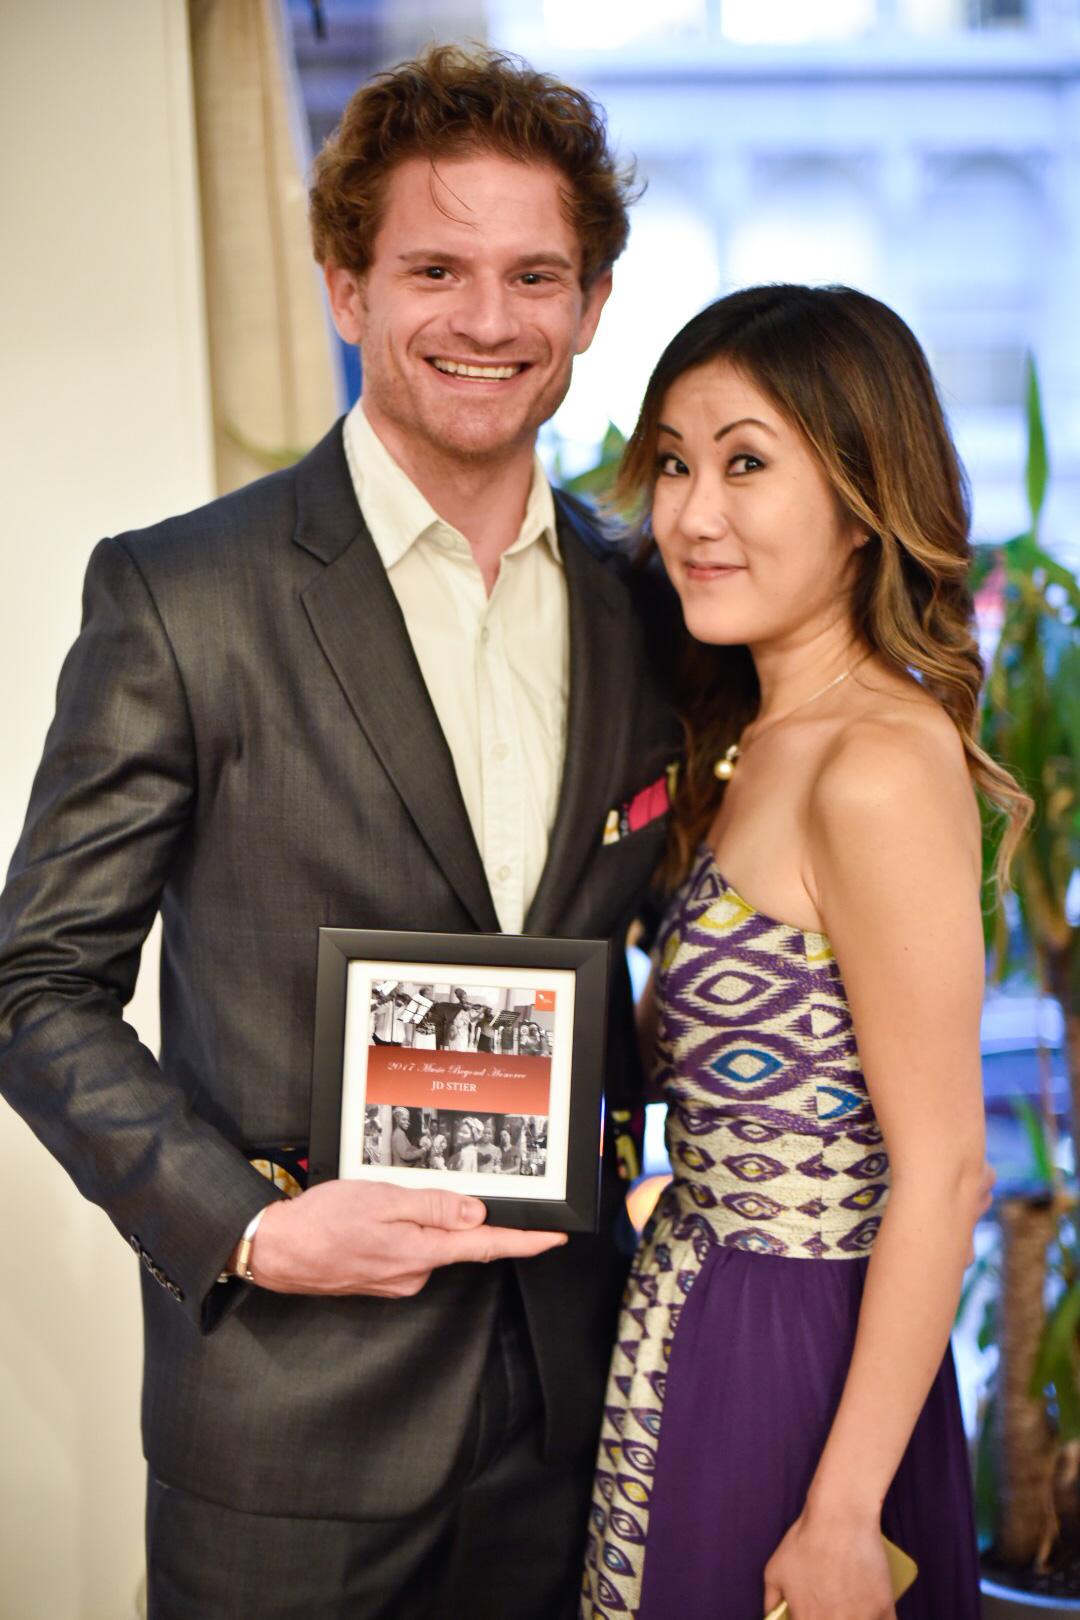 JD Stier and Kaori Fujii at Music Beyond's Third Annual Gala